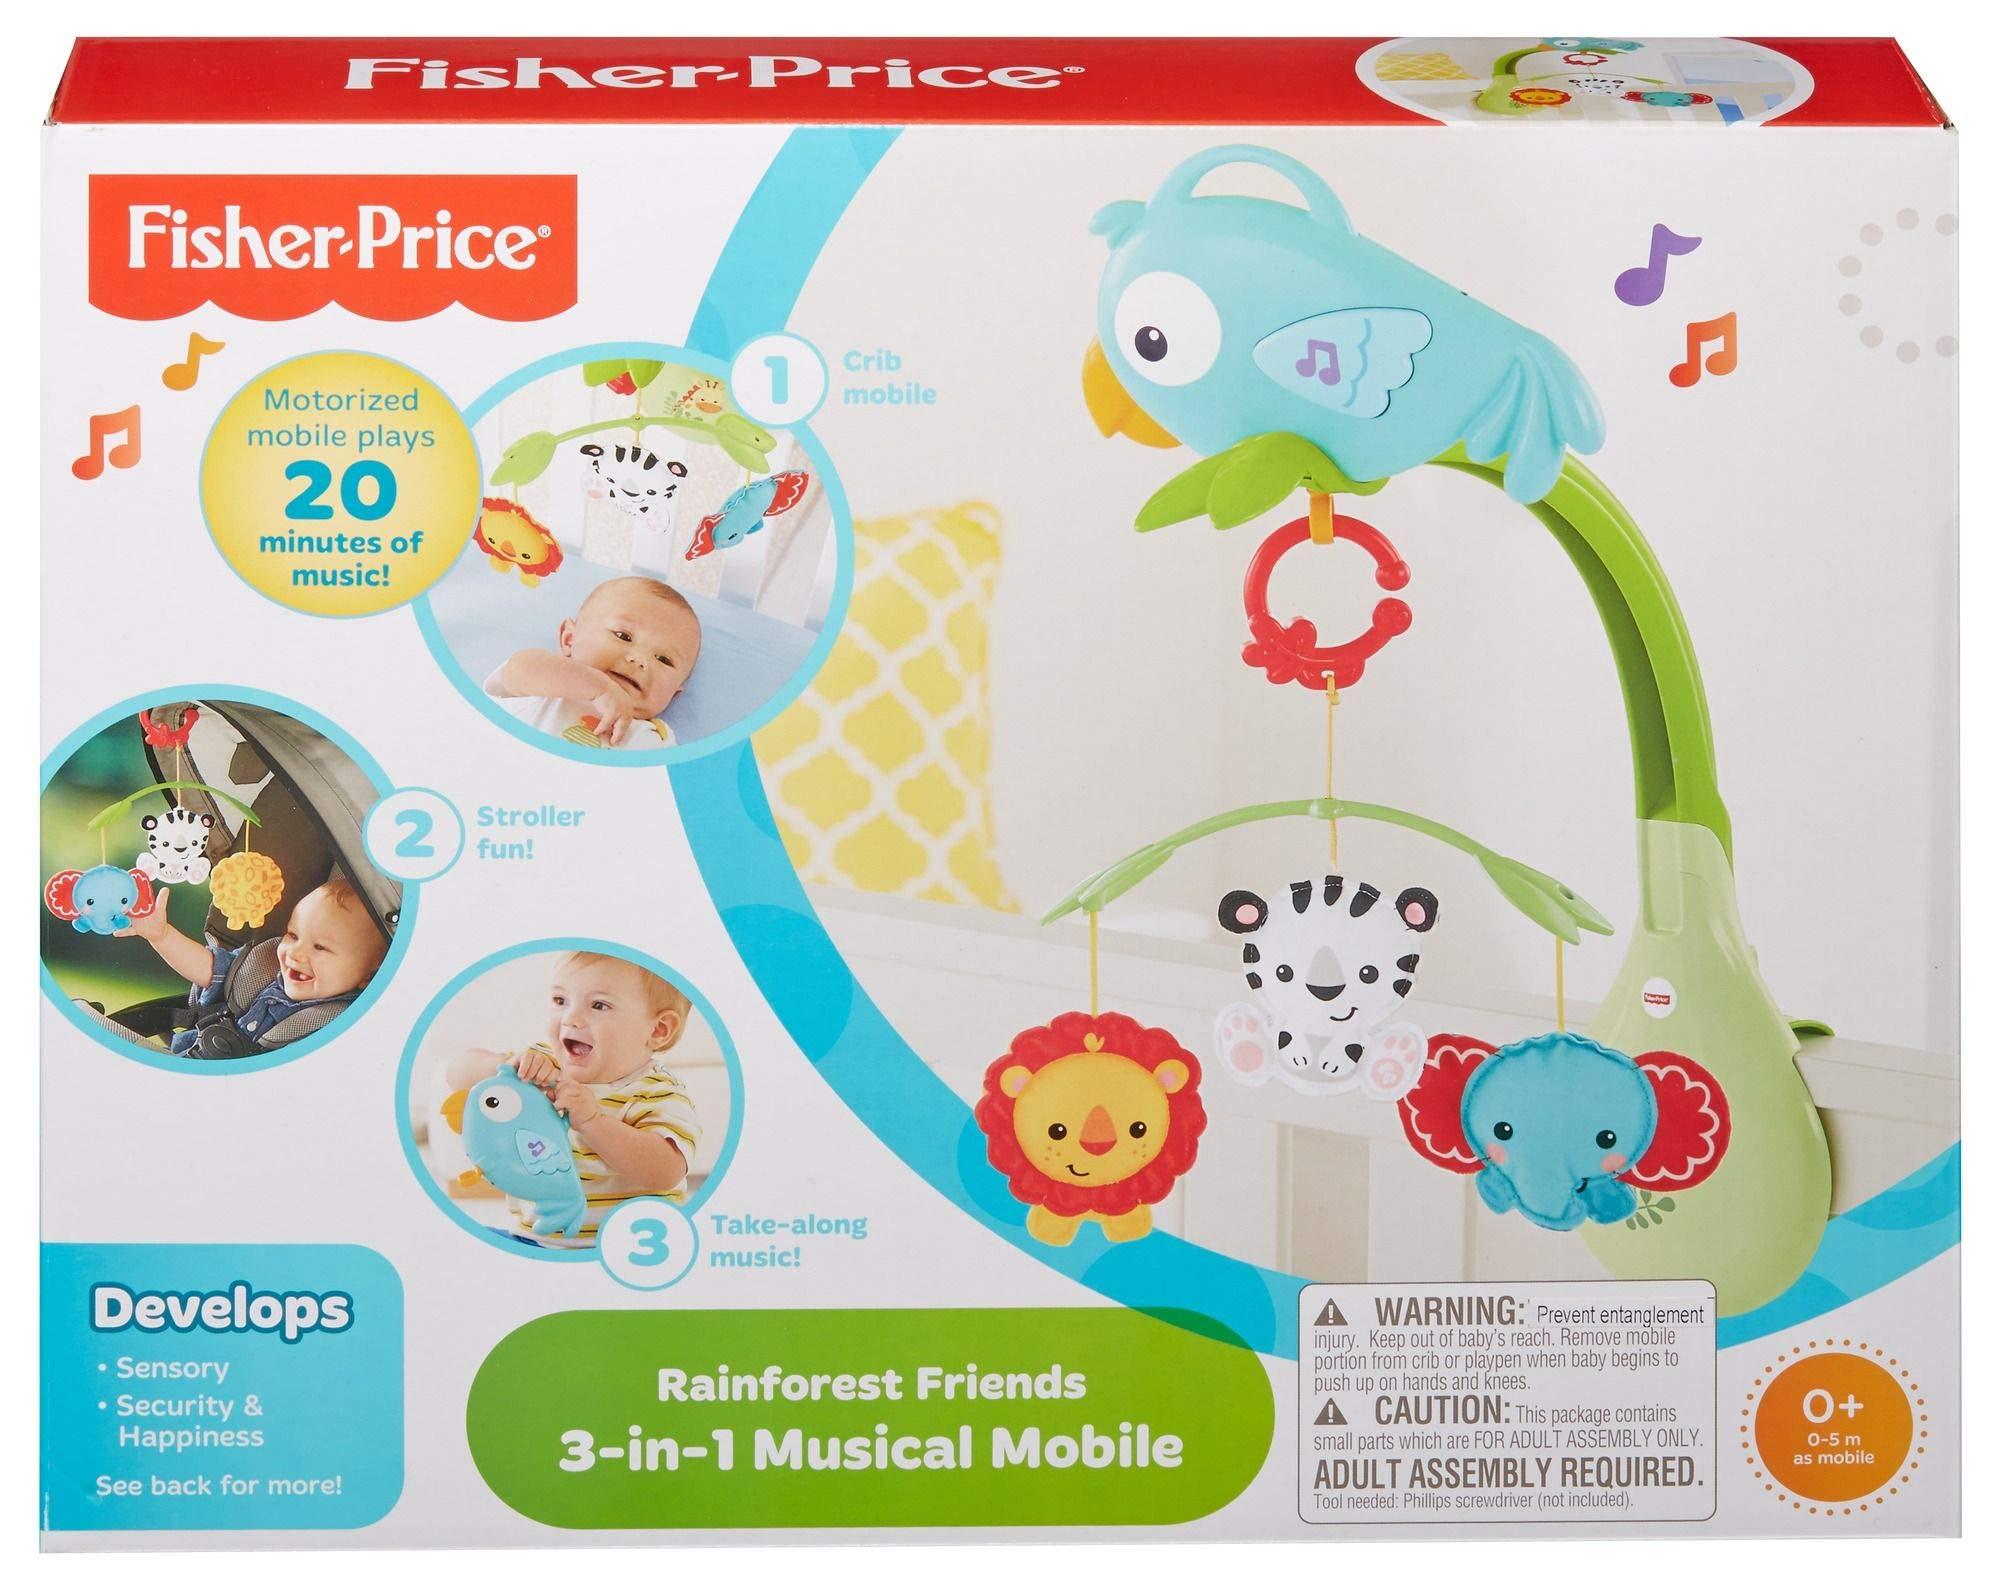 c4c0d251622 Amazon.co.uk: Mattel Fisher-Price: Sleeping & Soothing